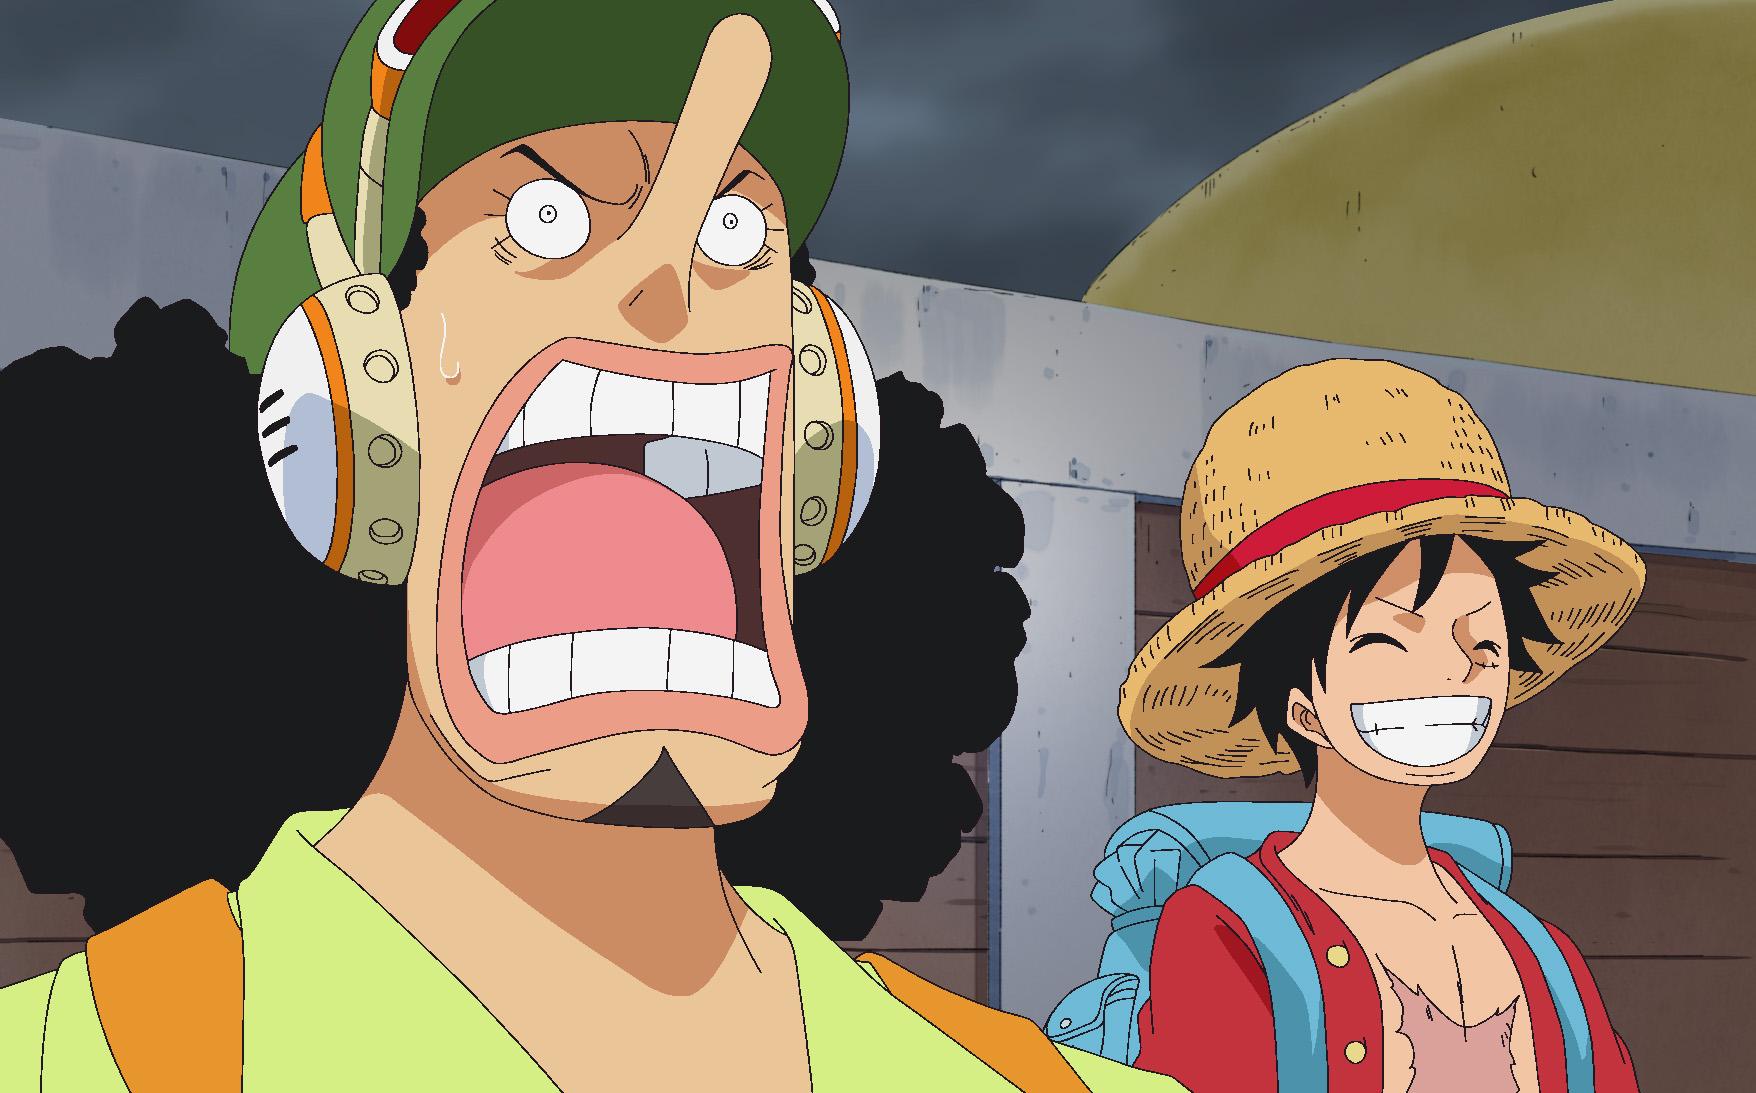 Watch One Piece Season 13 Episode 752 Sub & Dub | Anime